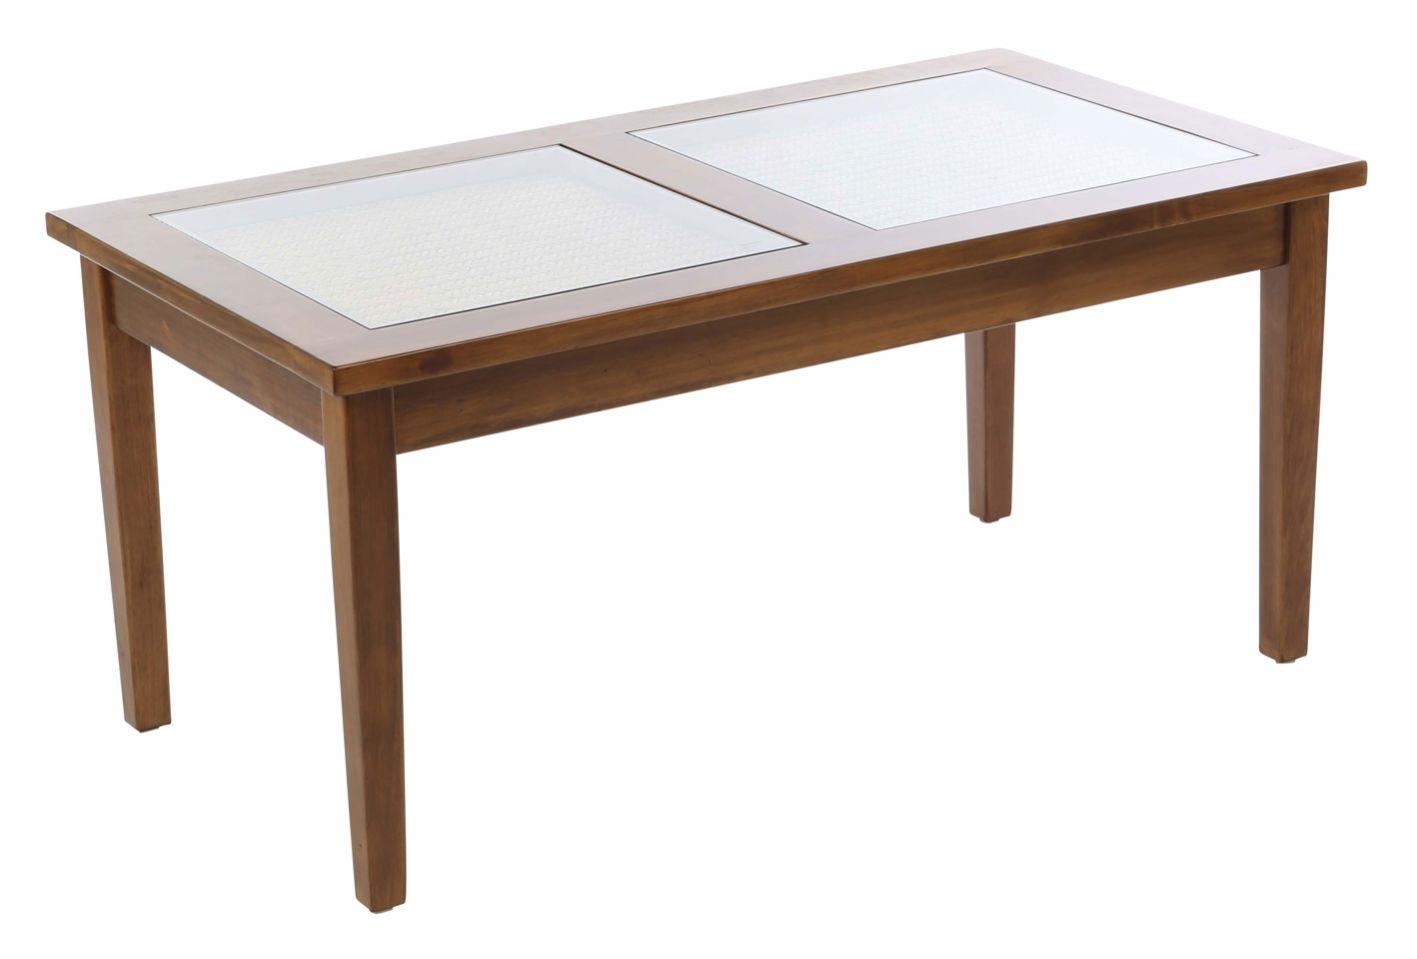 Tisch aphrodite dunkel couchtische for Tisch dunkel